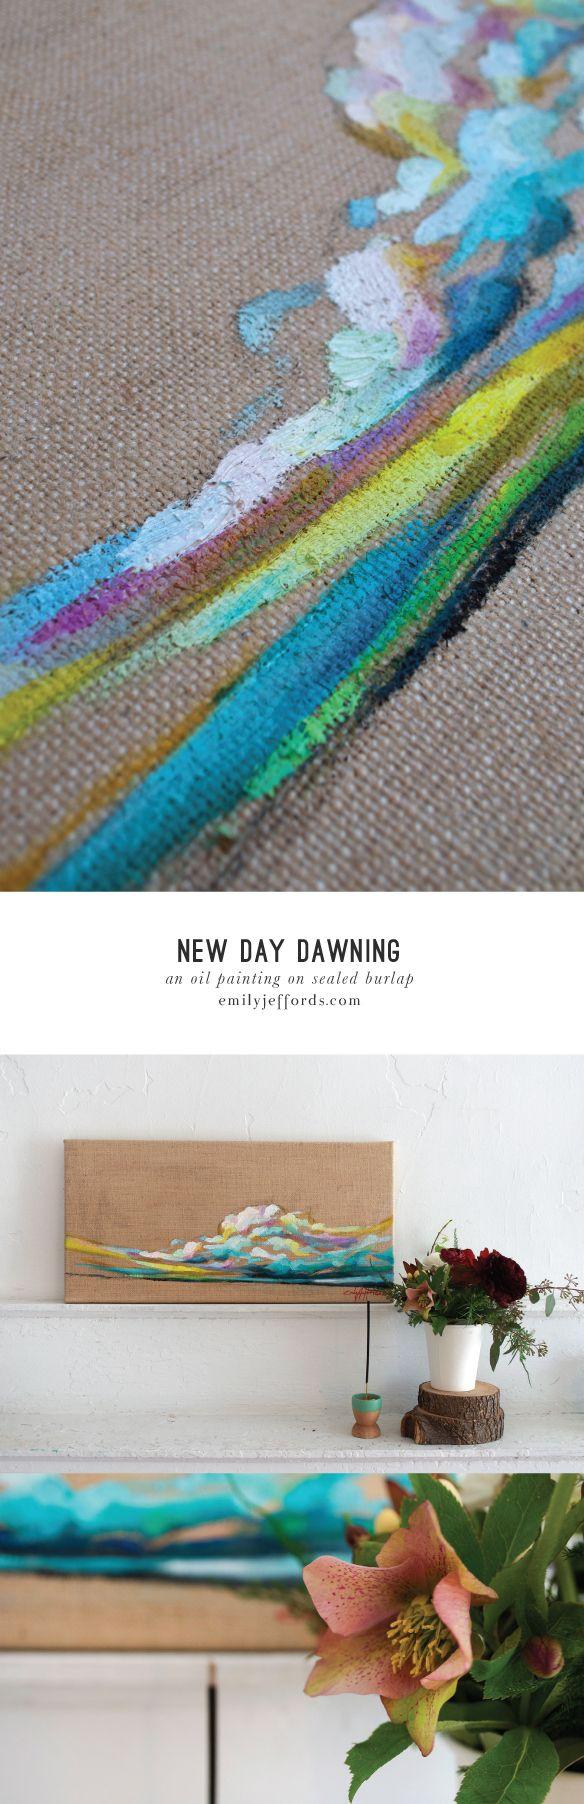 newday Dawning: Original Oil Landscape Painting Emily Jeffords